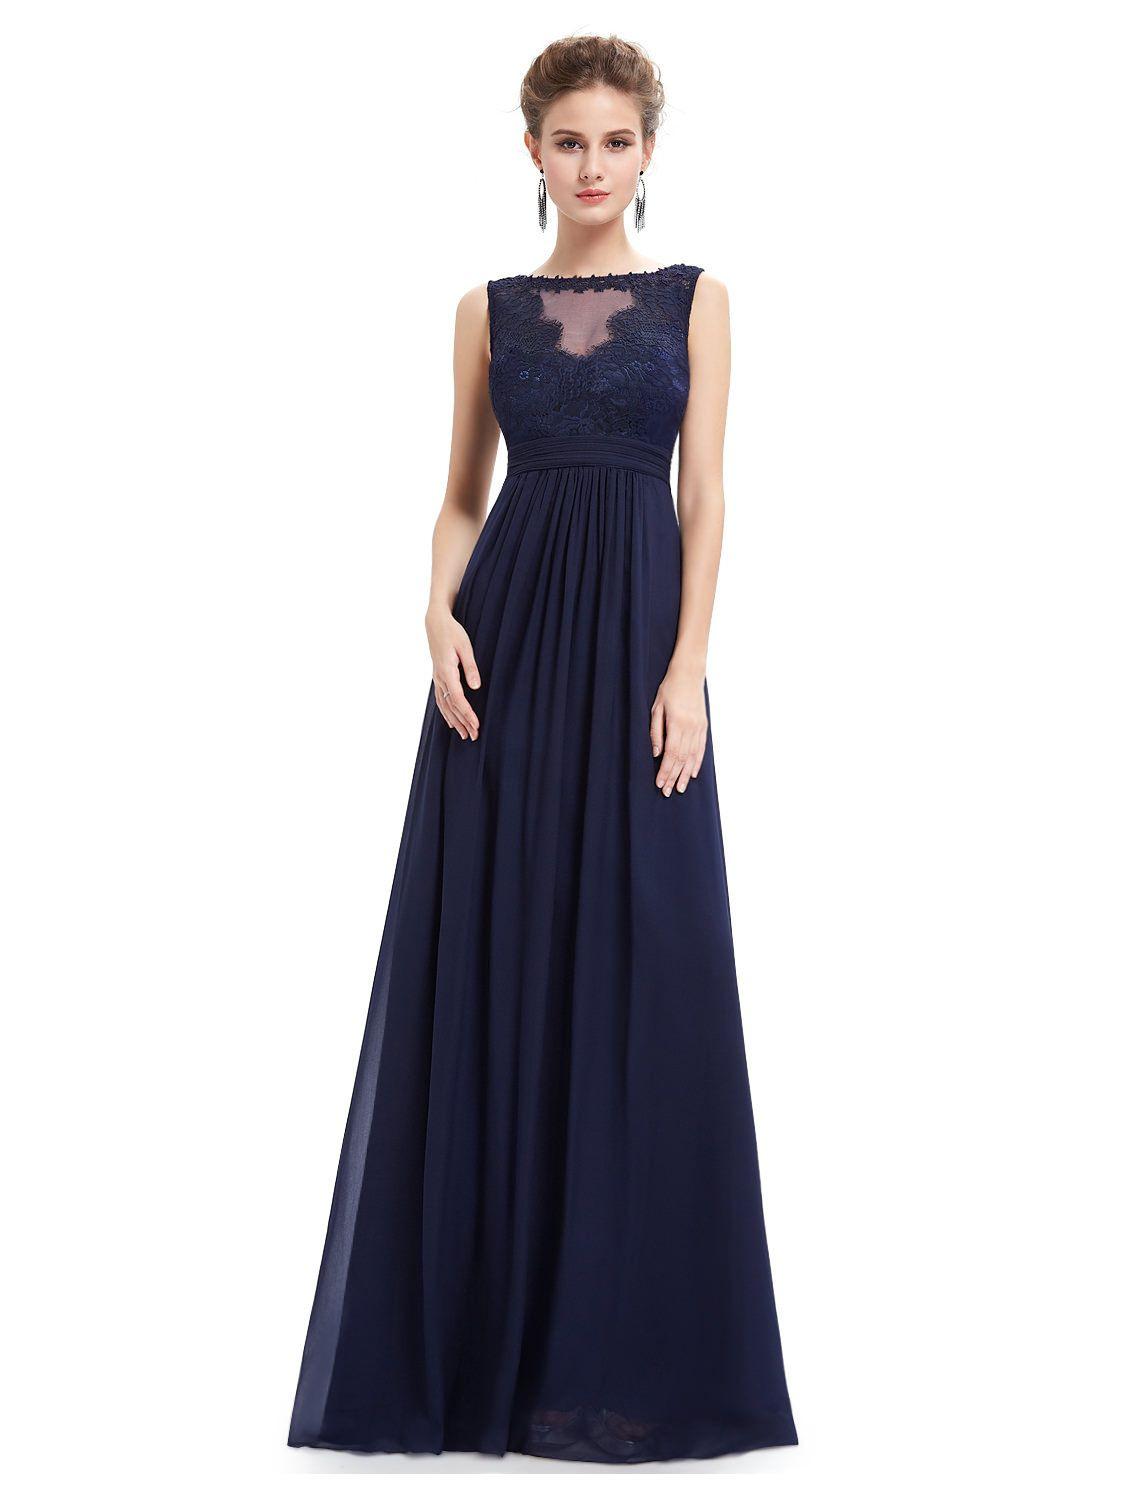 Designer Genial Dunkelblaues Bodenlanges Kleid für 201917 Schön Dunkelblaues Bodenlanges Kleid Vertrieb